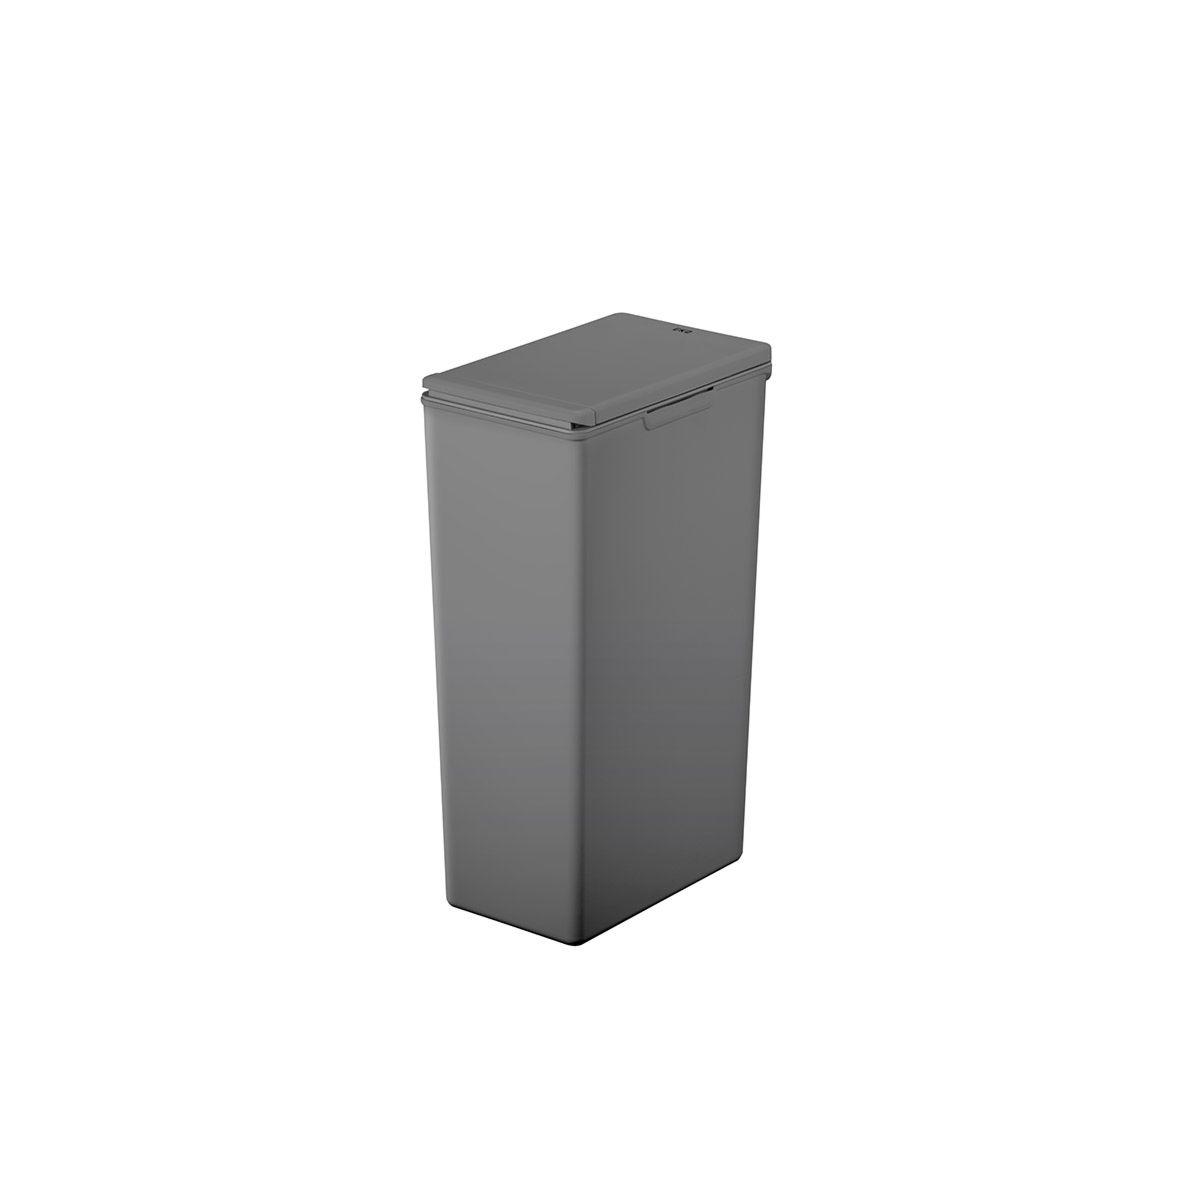 EKO Morandi 30L Touch Bin - Dark Grey